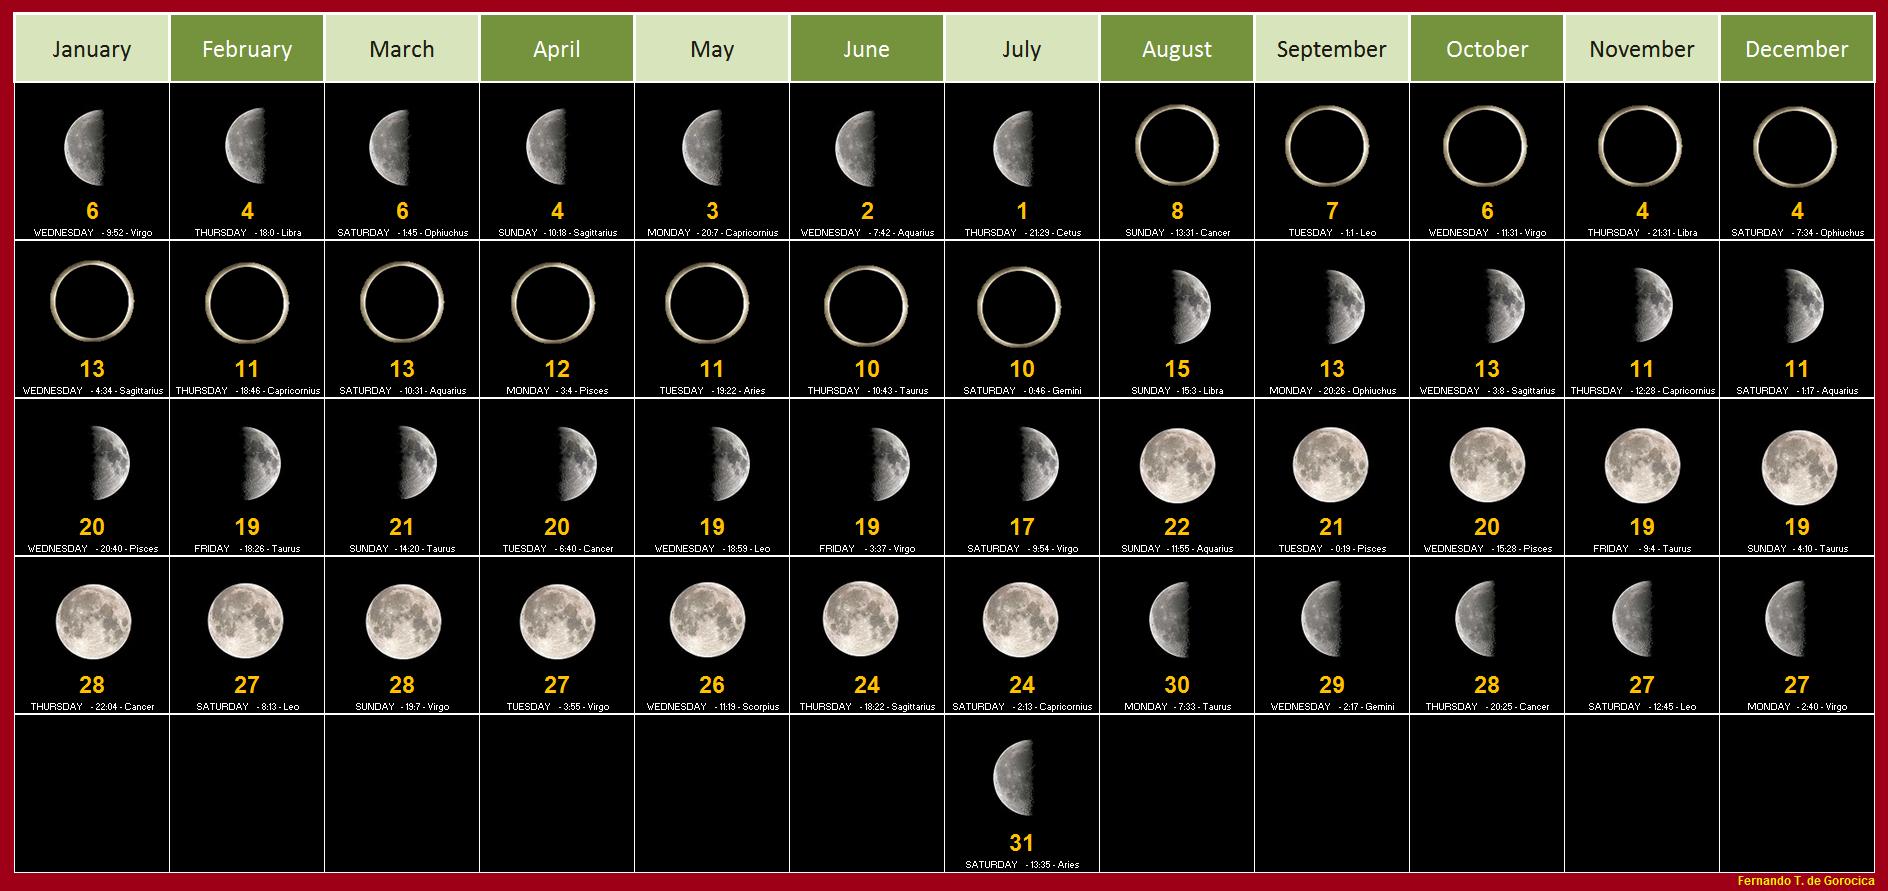 File:2021 Lunar Calendar - Wikimedia Commons